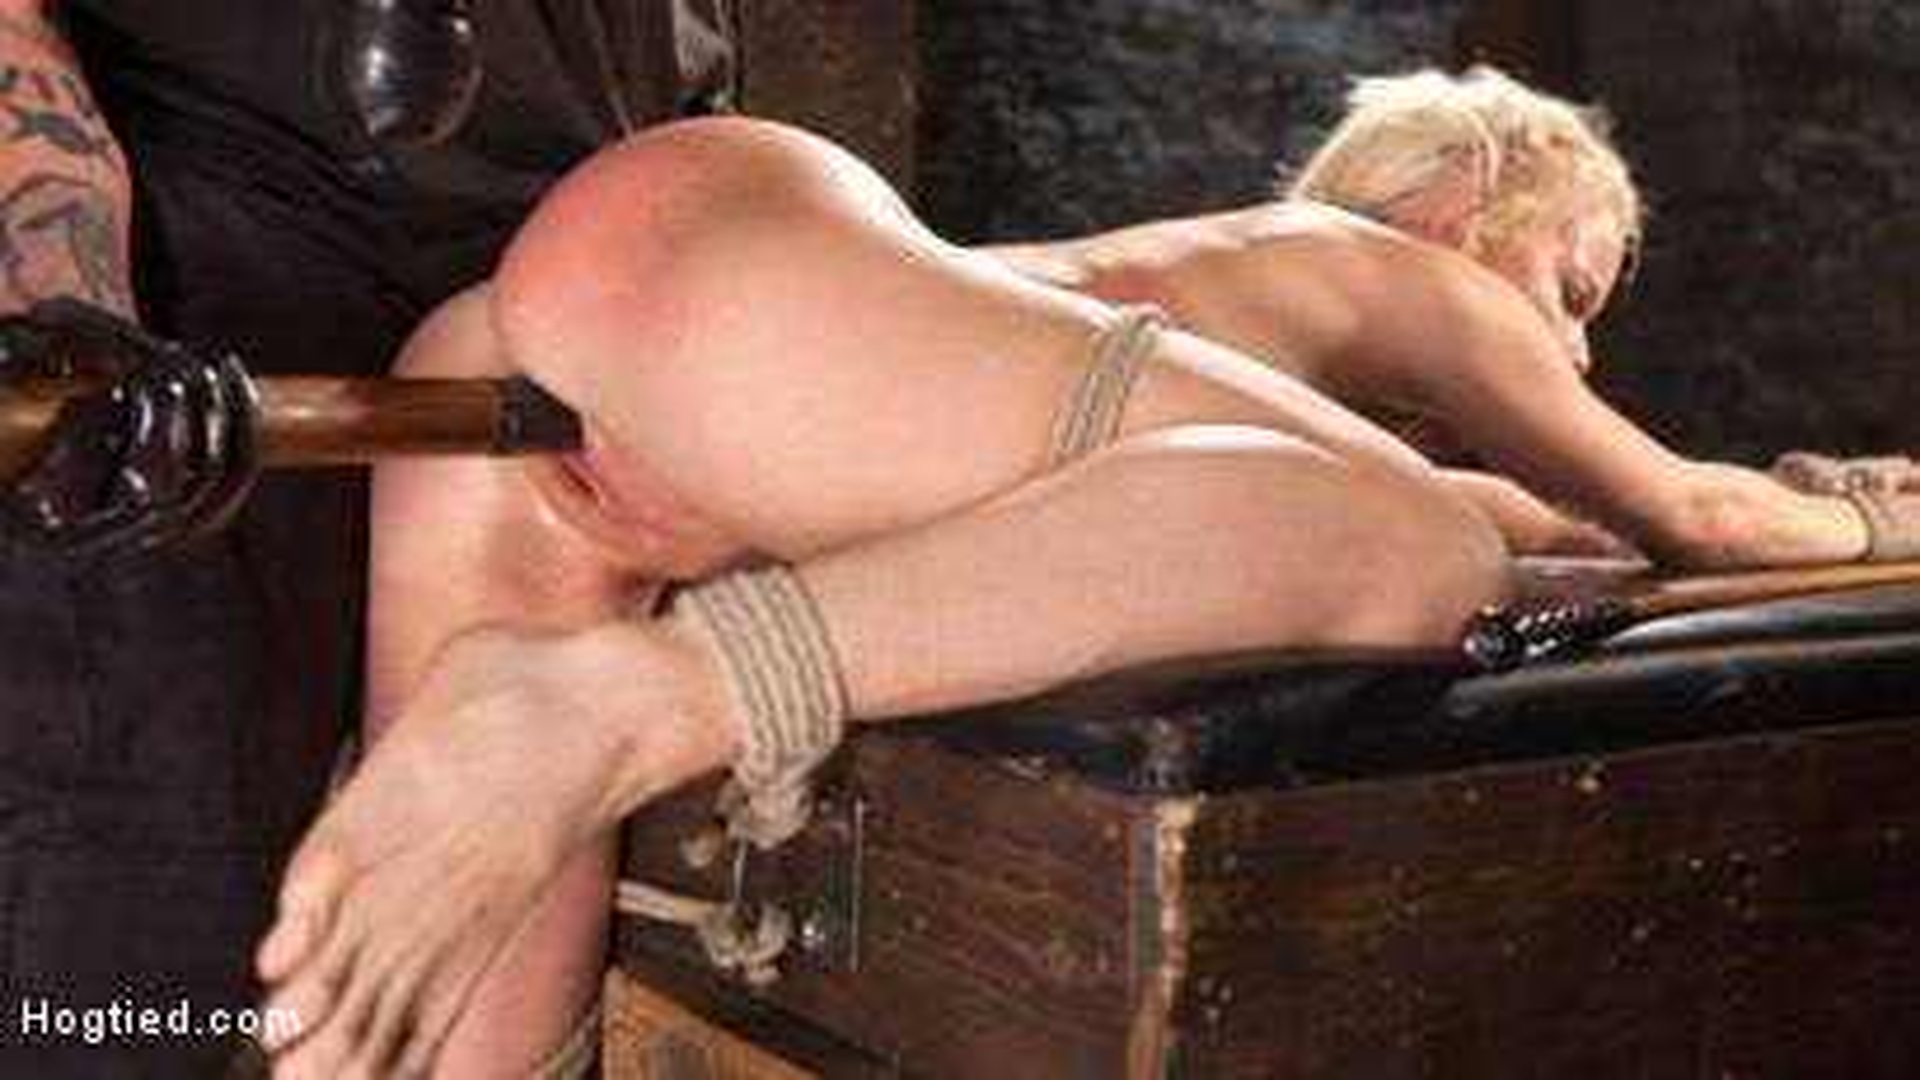 Photo number 8 from Blonde Bombshell Explodes in Extreme Bondage!! shot for Hogtied on Kink.com. Featuring Nikki Delano in hardcore BDSM & Fetish porn.